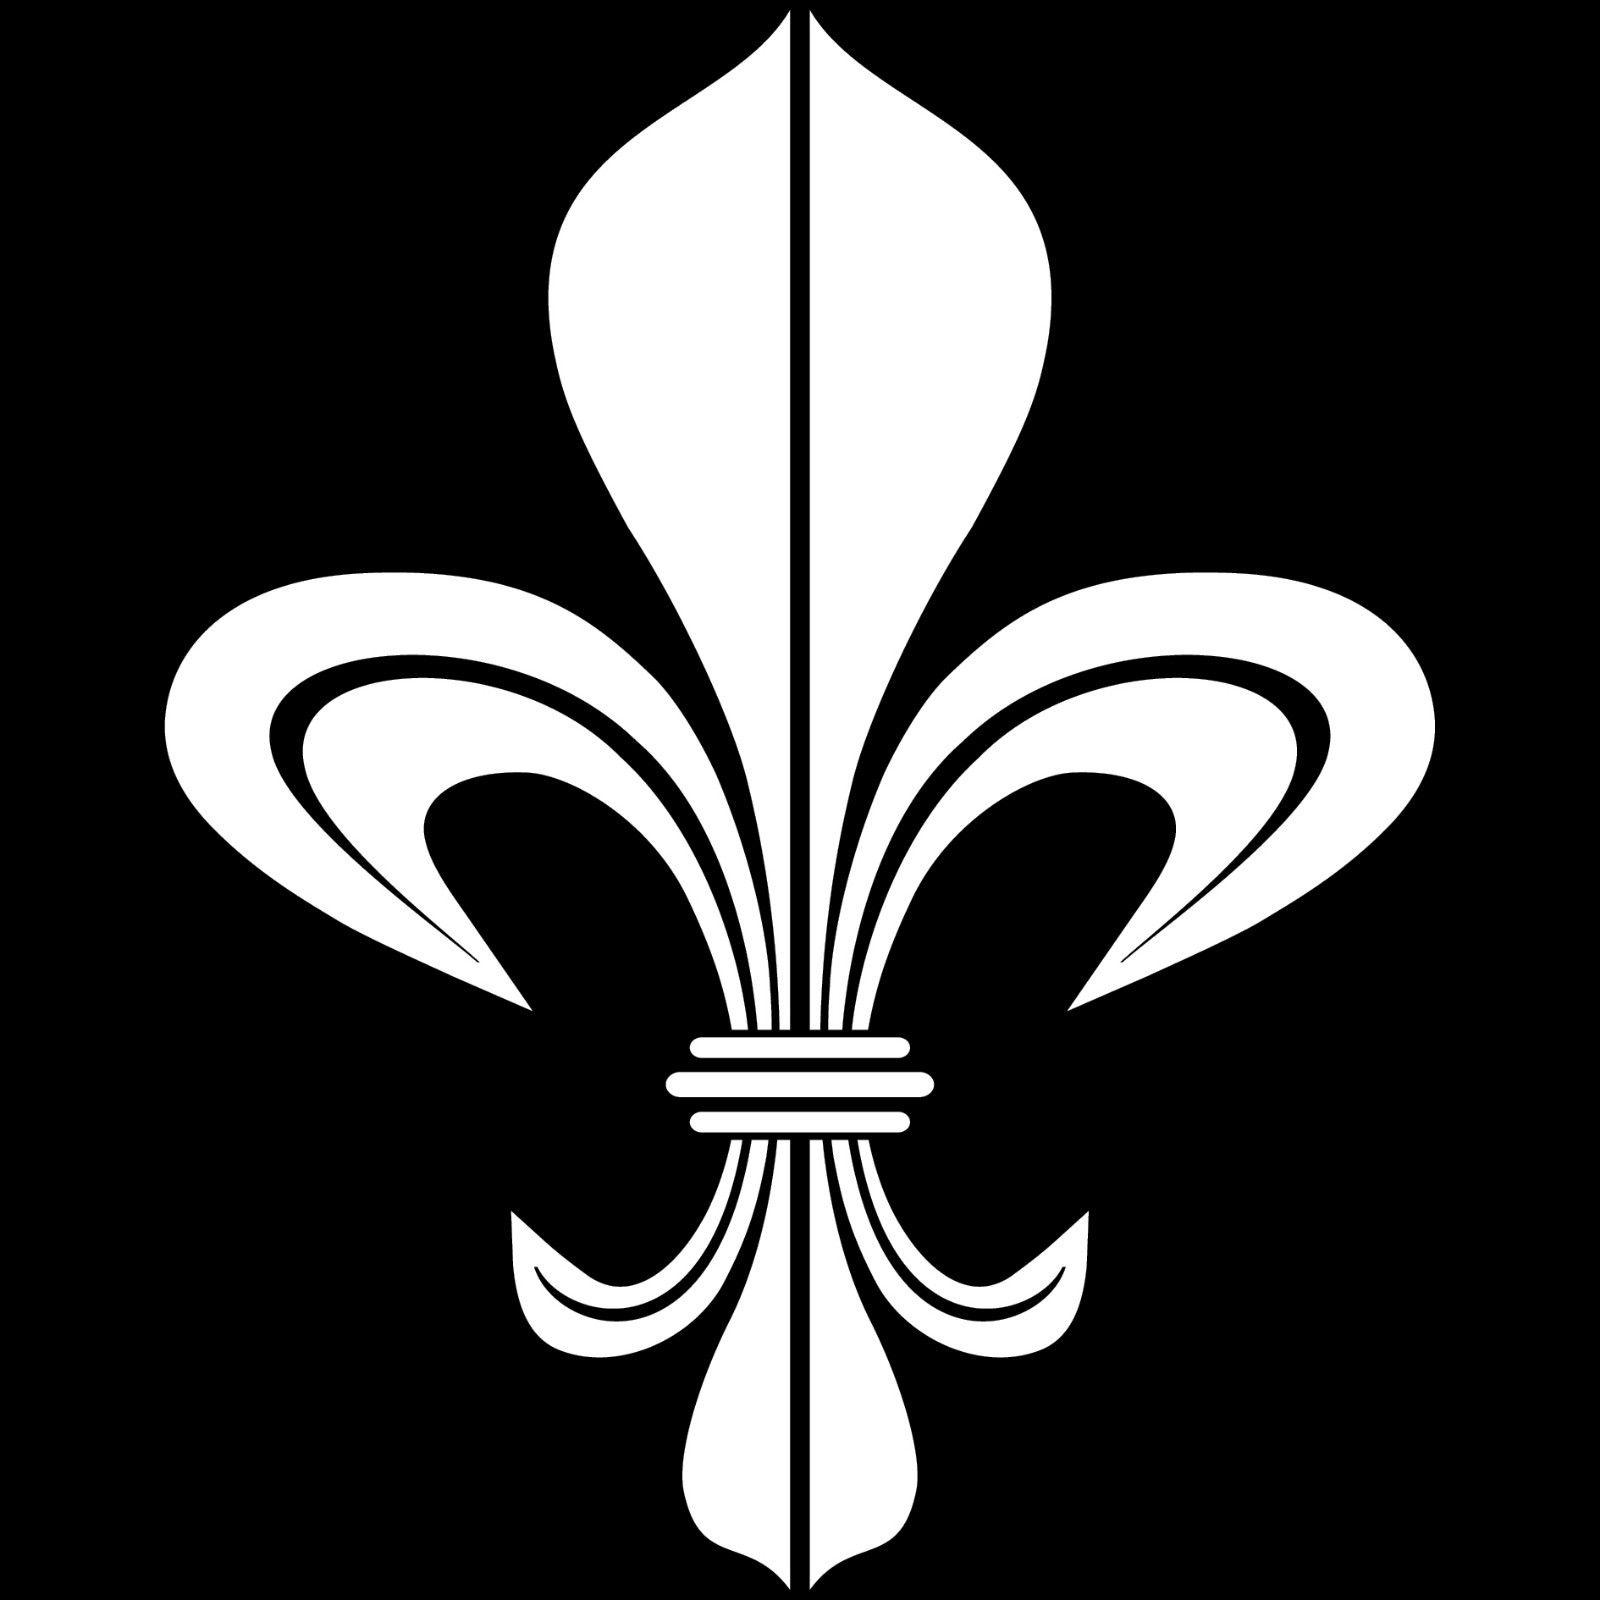 4 aufkleber tattoo 17cm wei bourbon lilie fleur de lis deko folie klebefolie kaufen bei green it. Black Bedroom Furniture Sets. Home Design Ideas